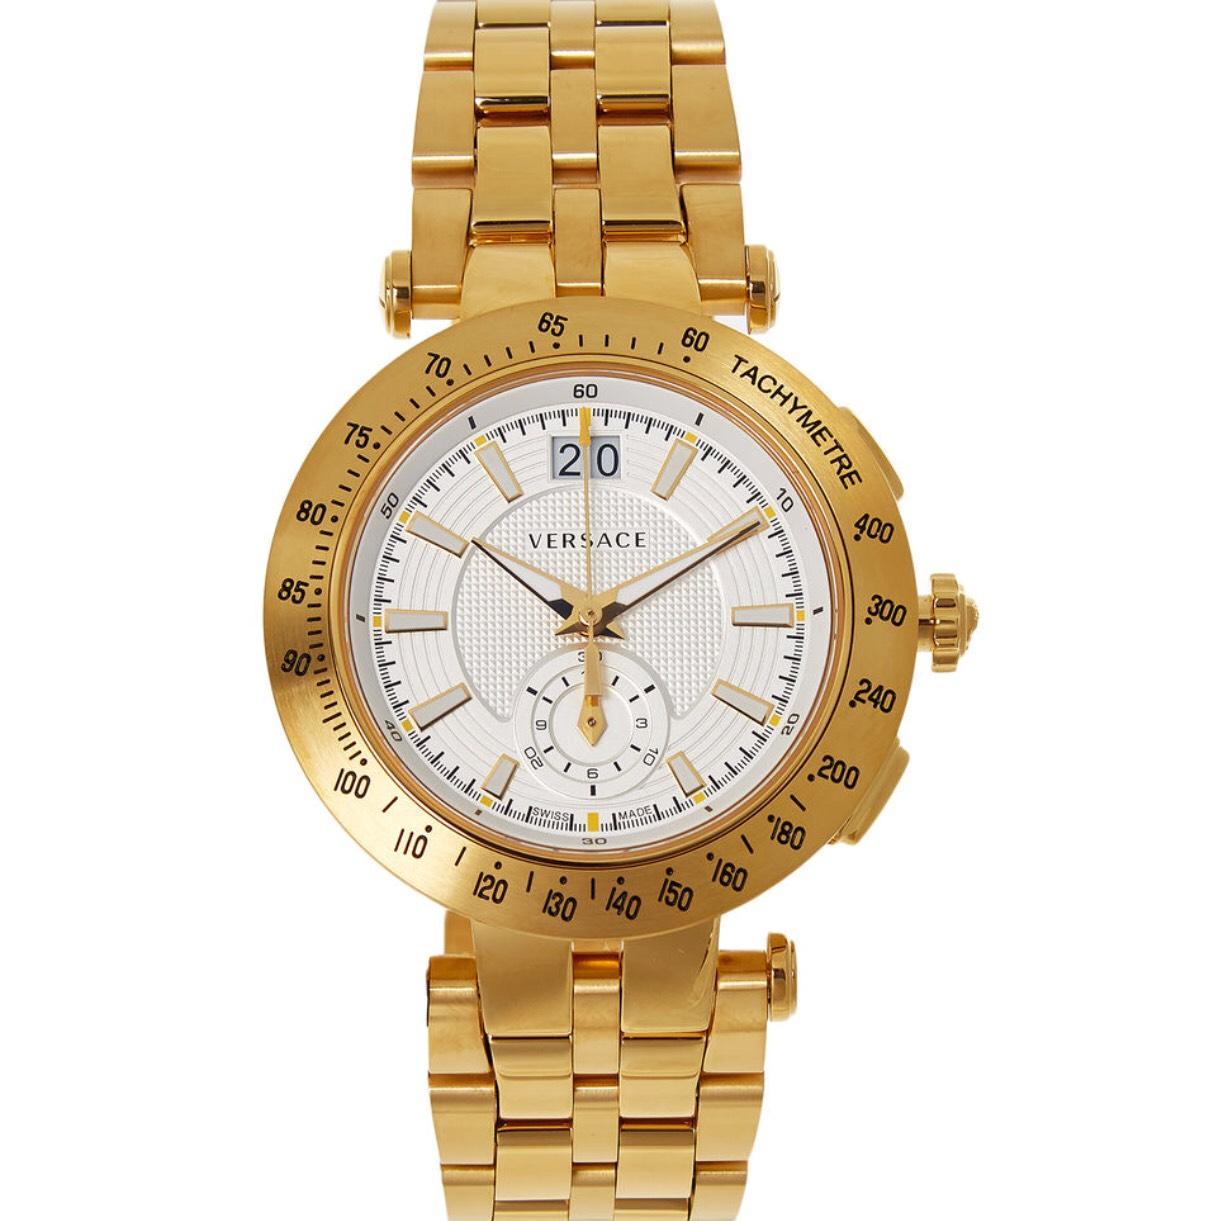 Versace V-Race gold plated watch Women's £262 @ TK Maxx